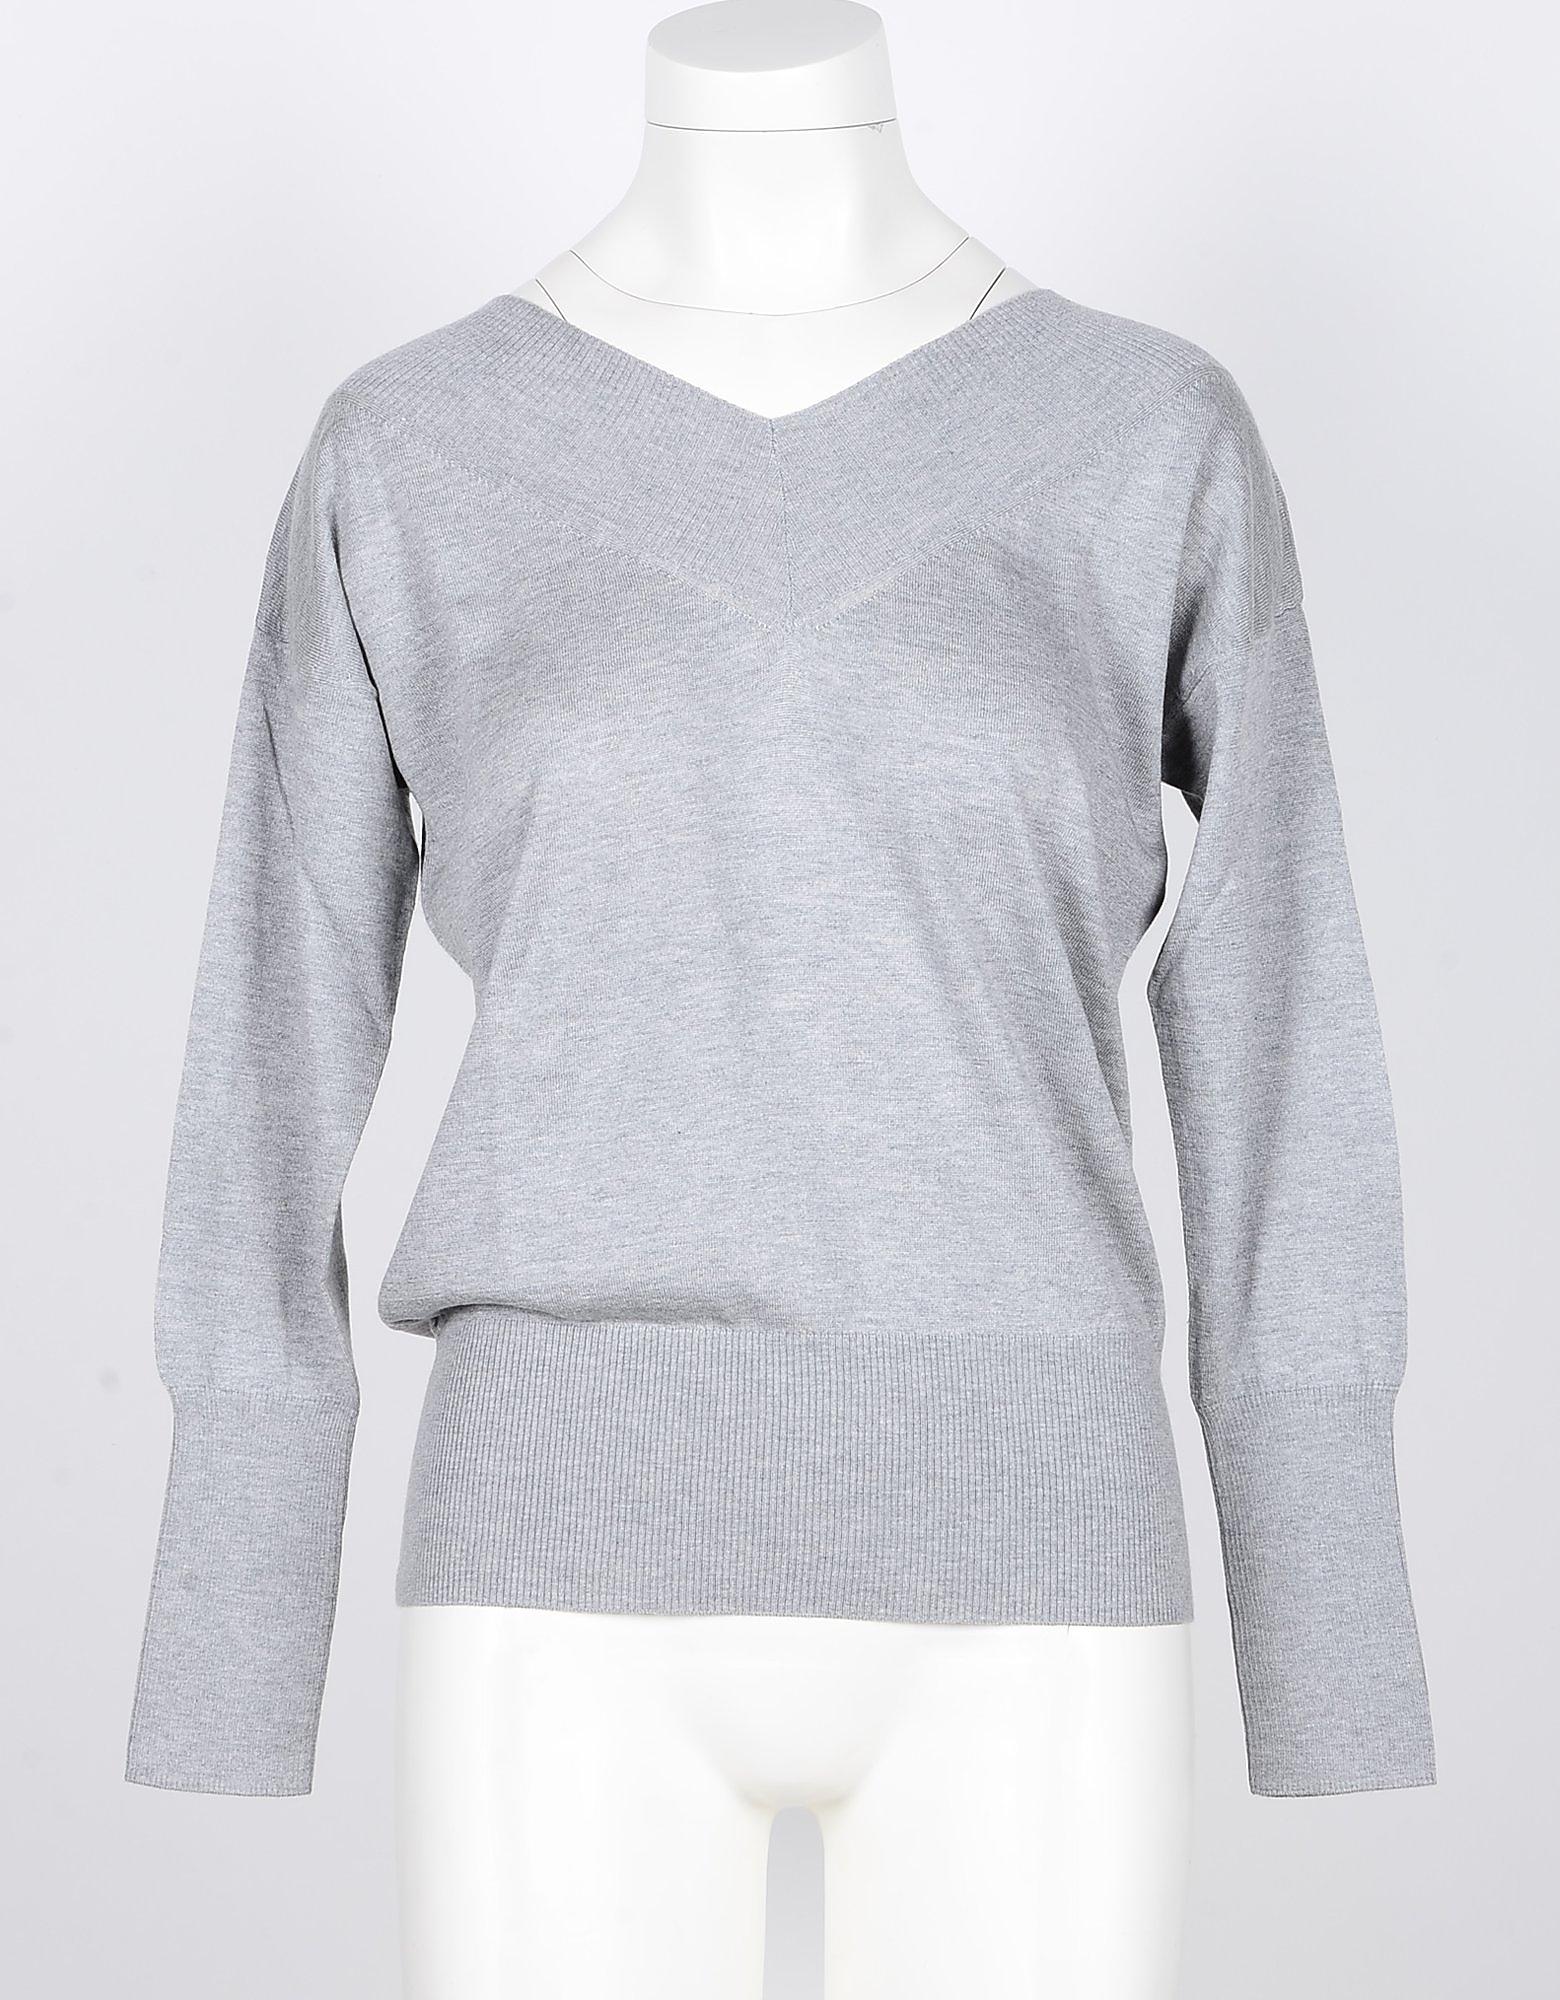 SNOBBY SHEEP Designer Knitwear, Light Gray Silk and Cashmere Blend Women's V-Neck Sweater